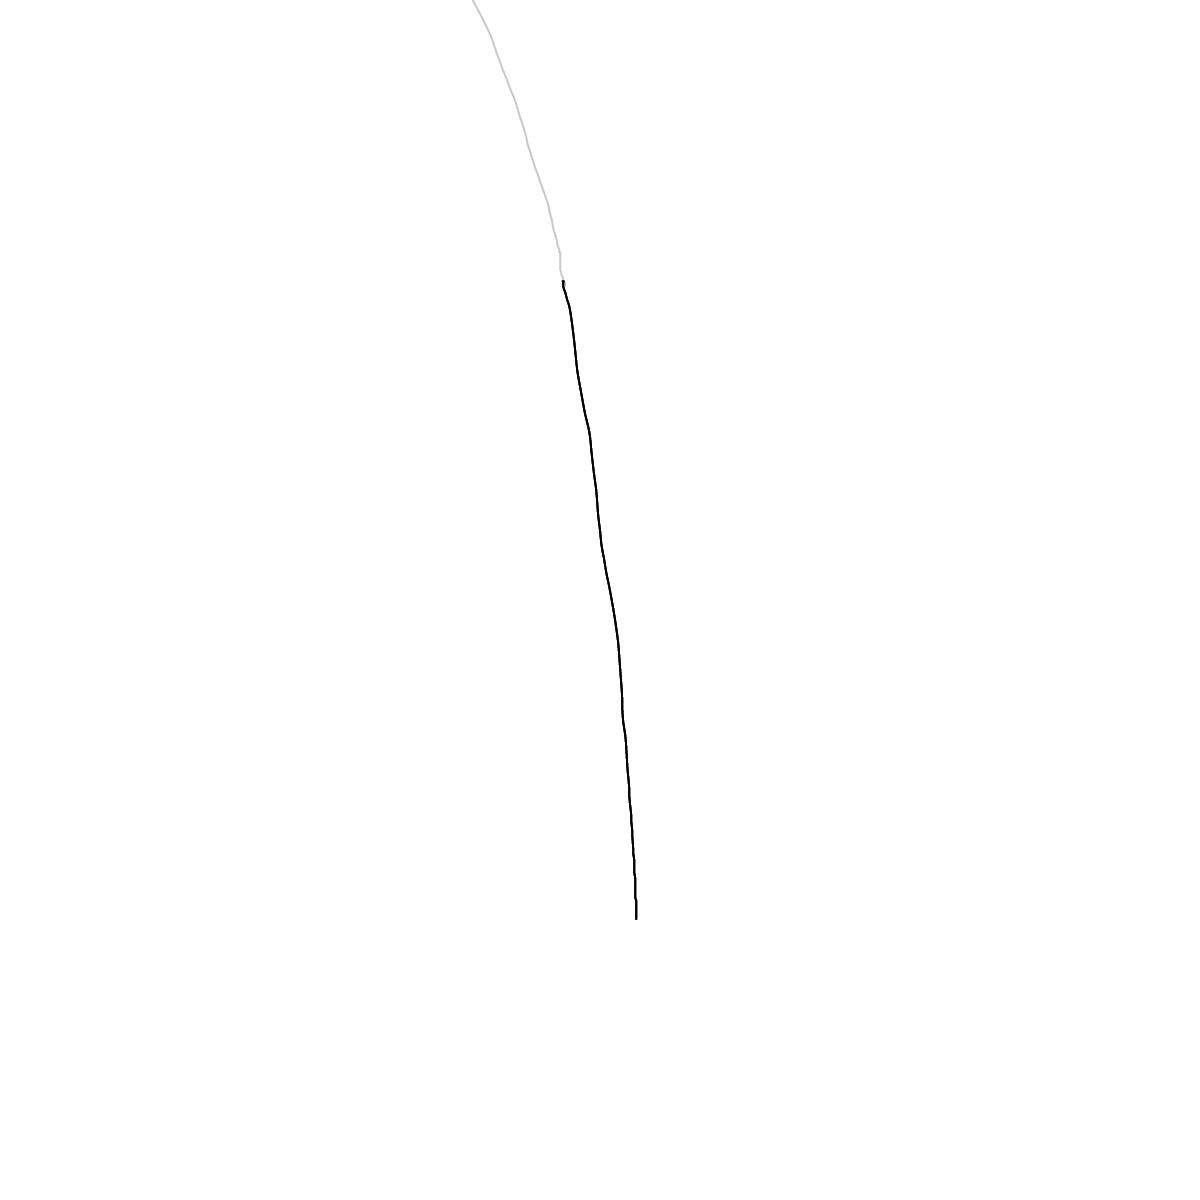 BAAAM drawing#18081 lat:40.7131652832031250lng: -74.0121078491211000